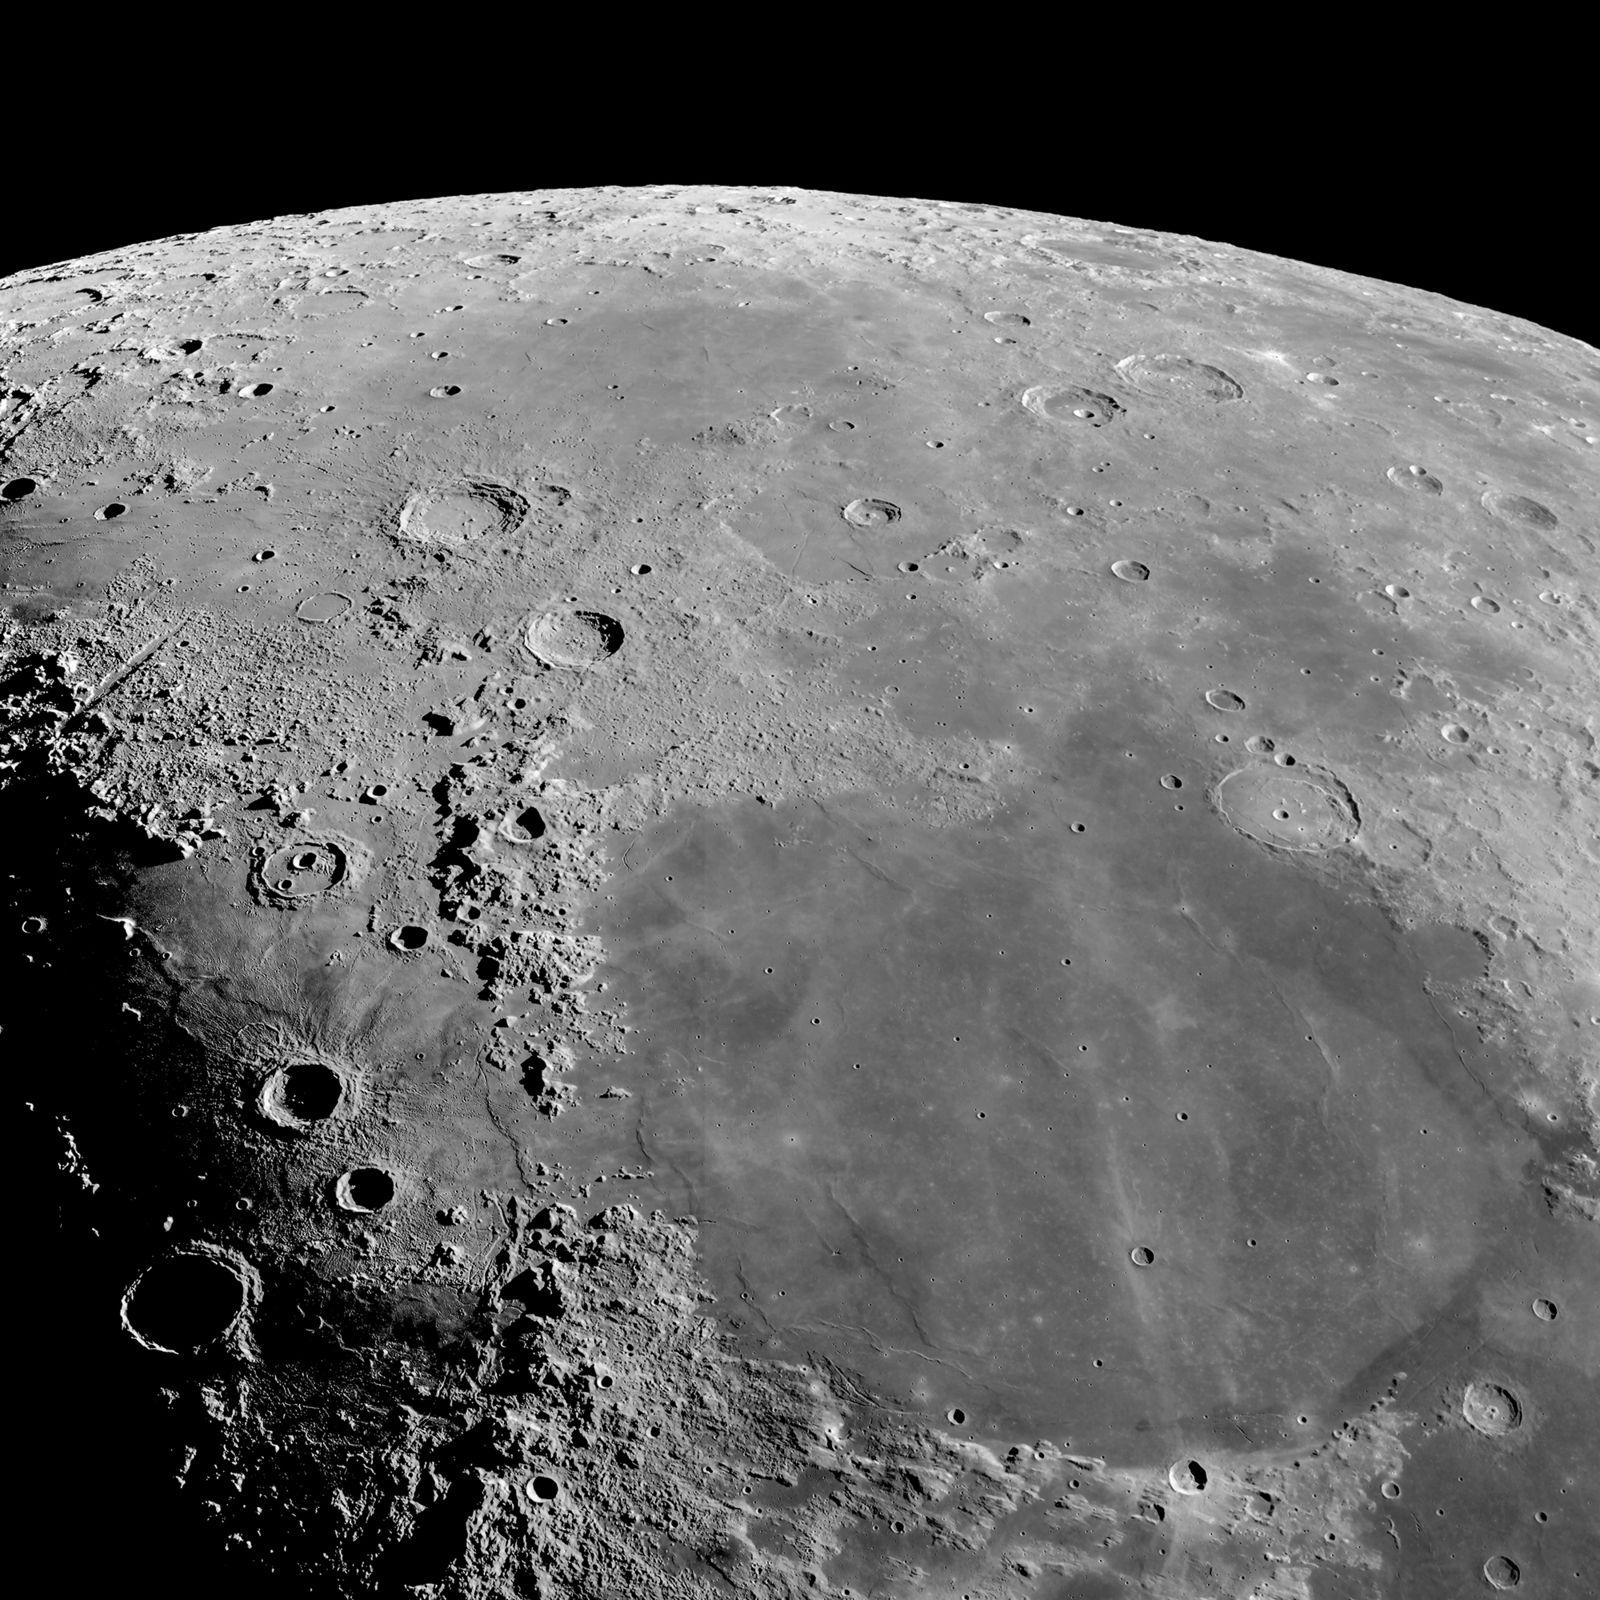 Lune - Moon - Pleiades NEo 3 - Satellite - Calibration - Earth Observation - Super lune - Juin 2021 - Perigee